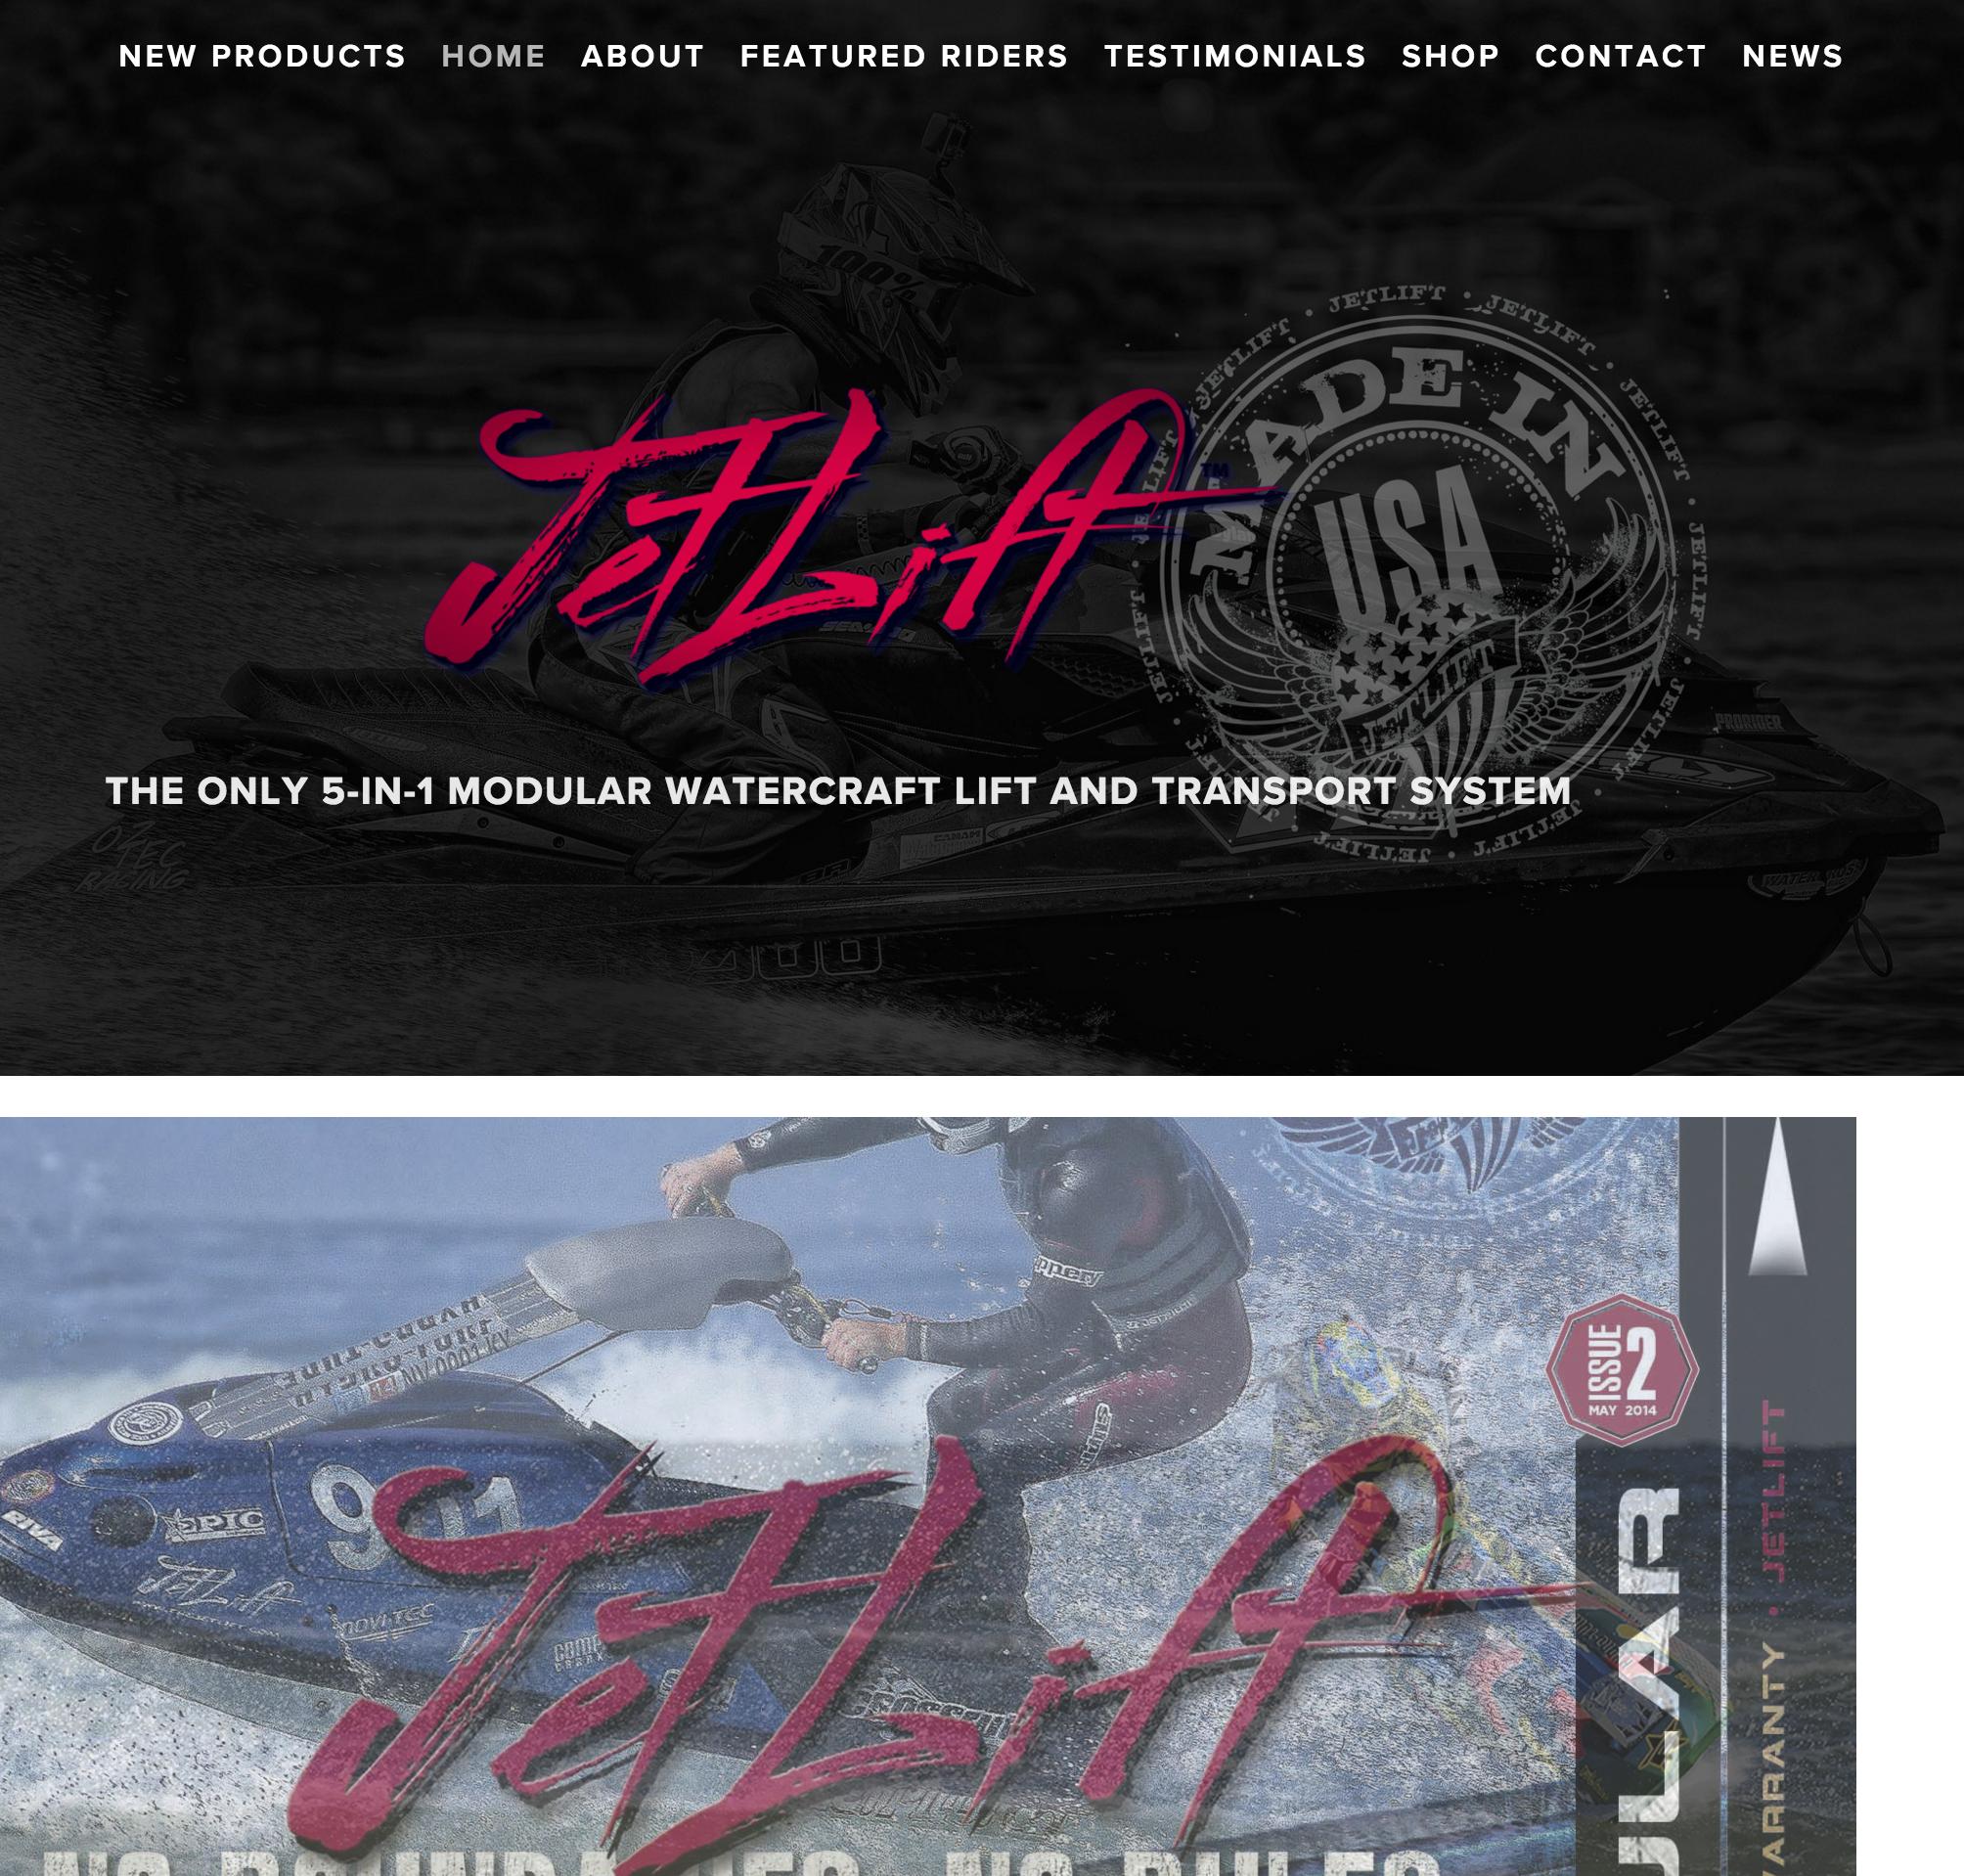 JetLift Website